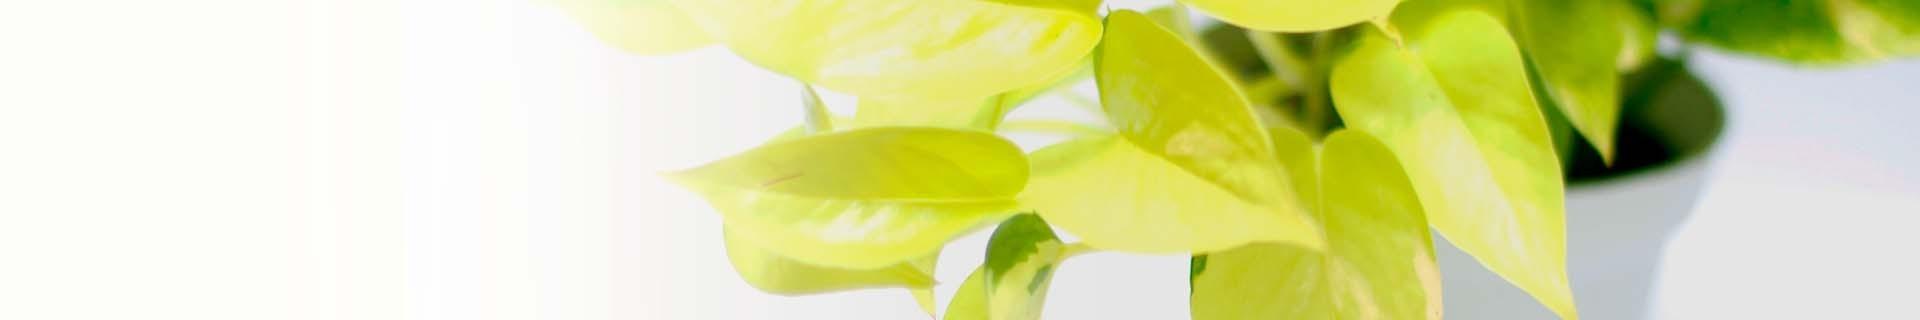 Plantas km 0: helecho, filodendro, cirtomio, cuerno de alce, davalia.